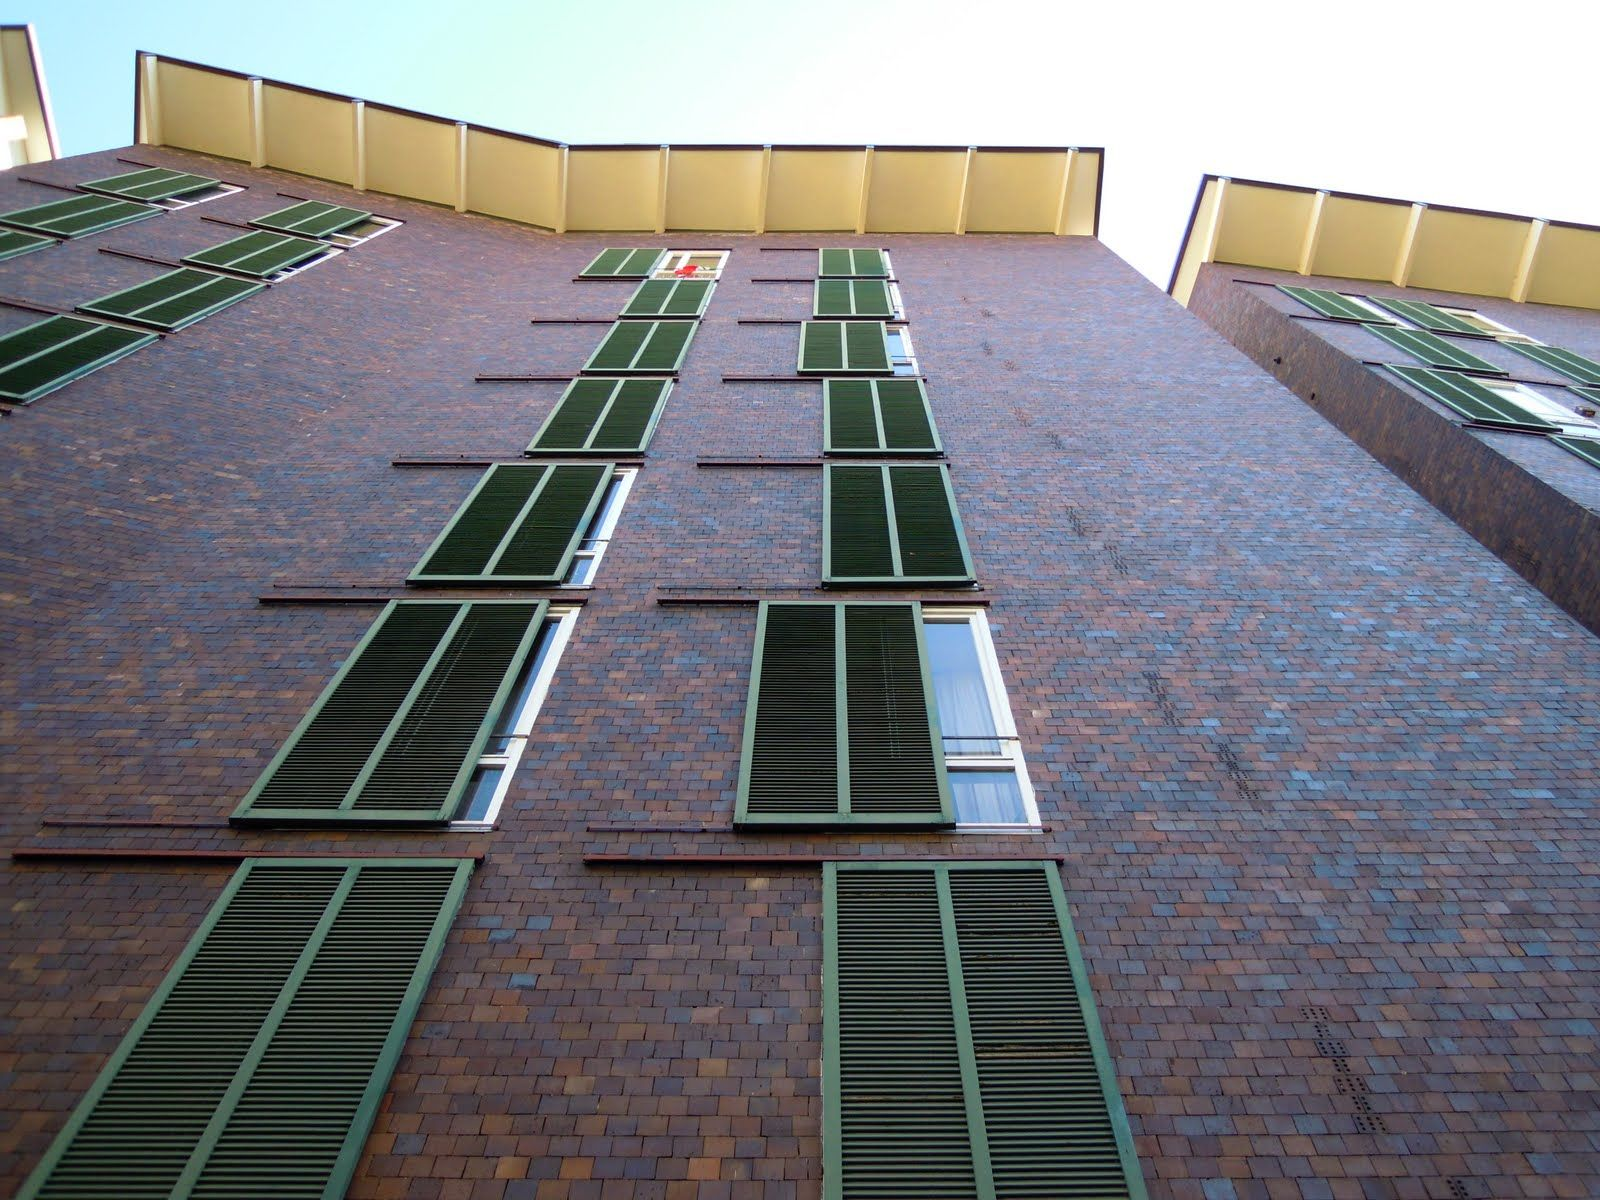 Casa impiegati borsalino gardella absorbing modernity for Casa borsalino gardella